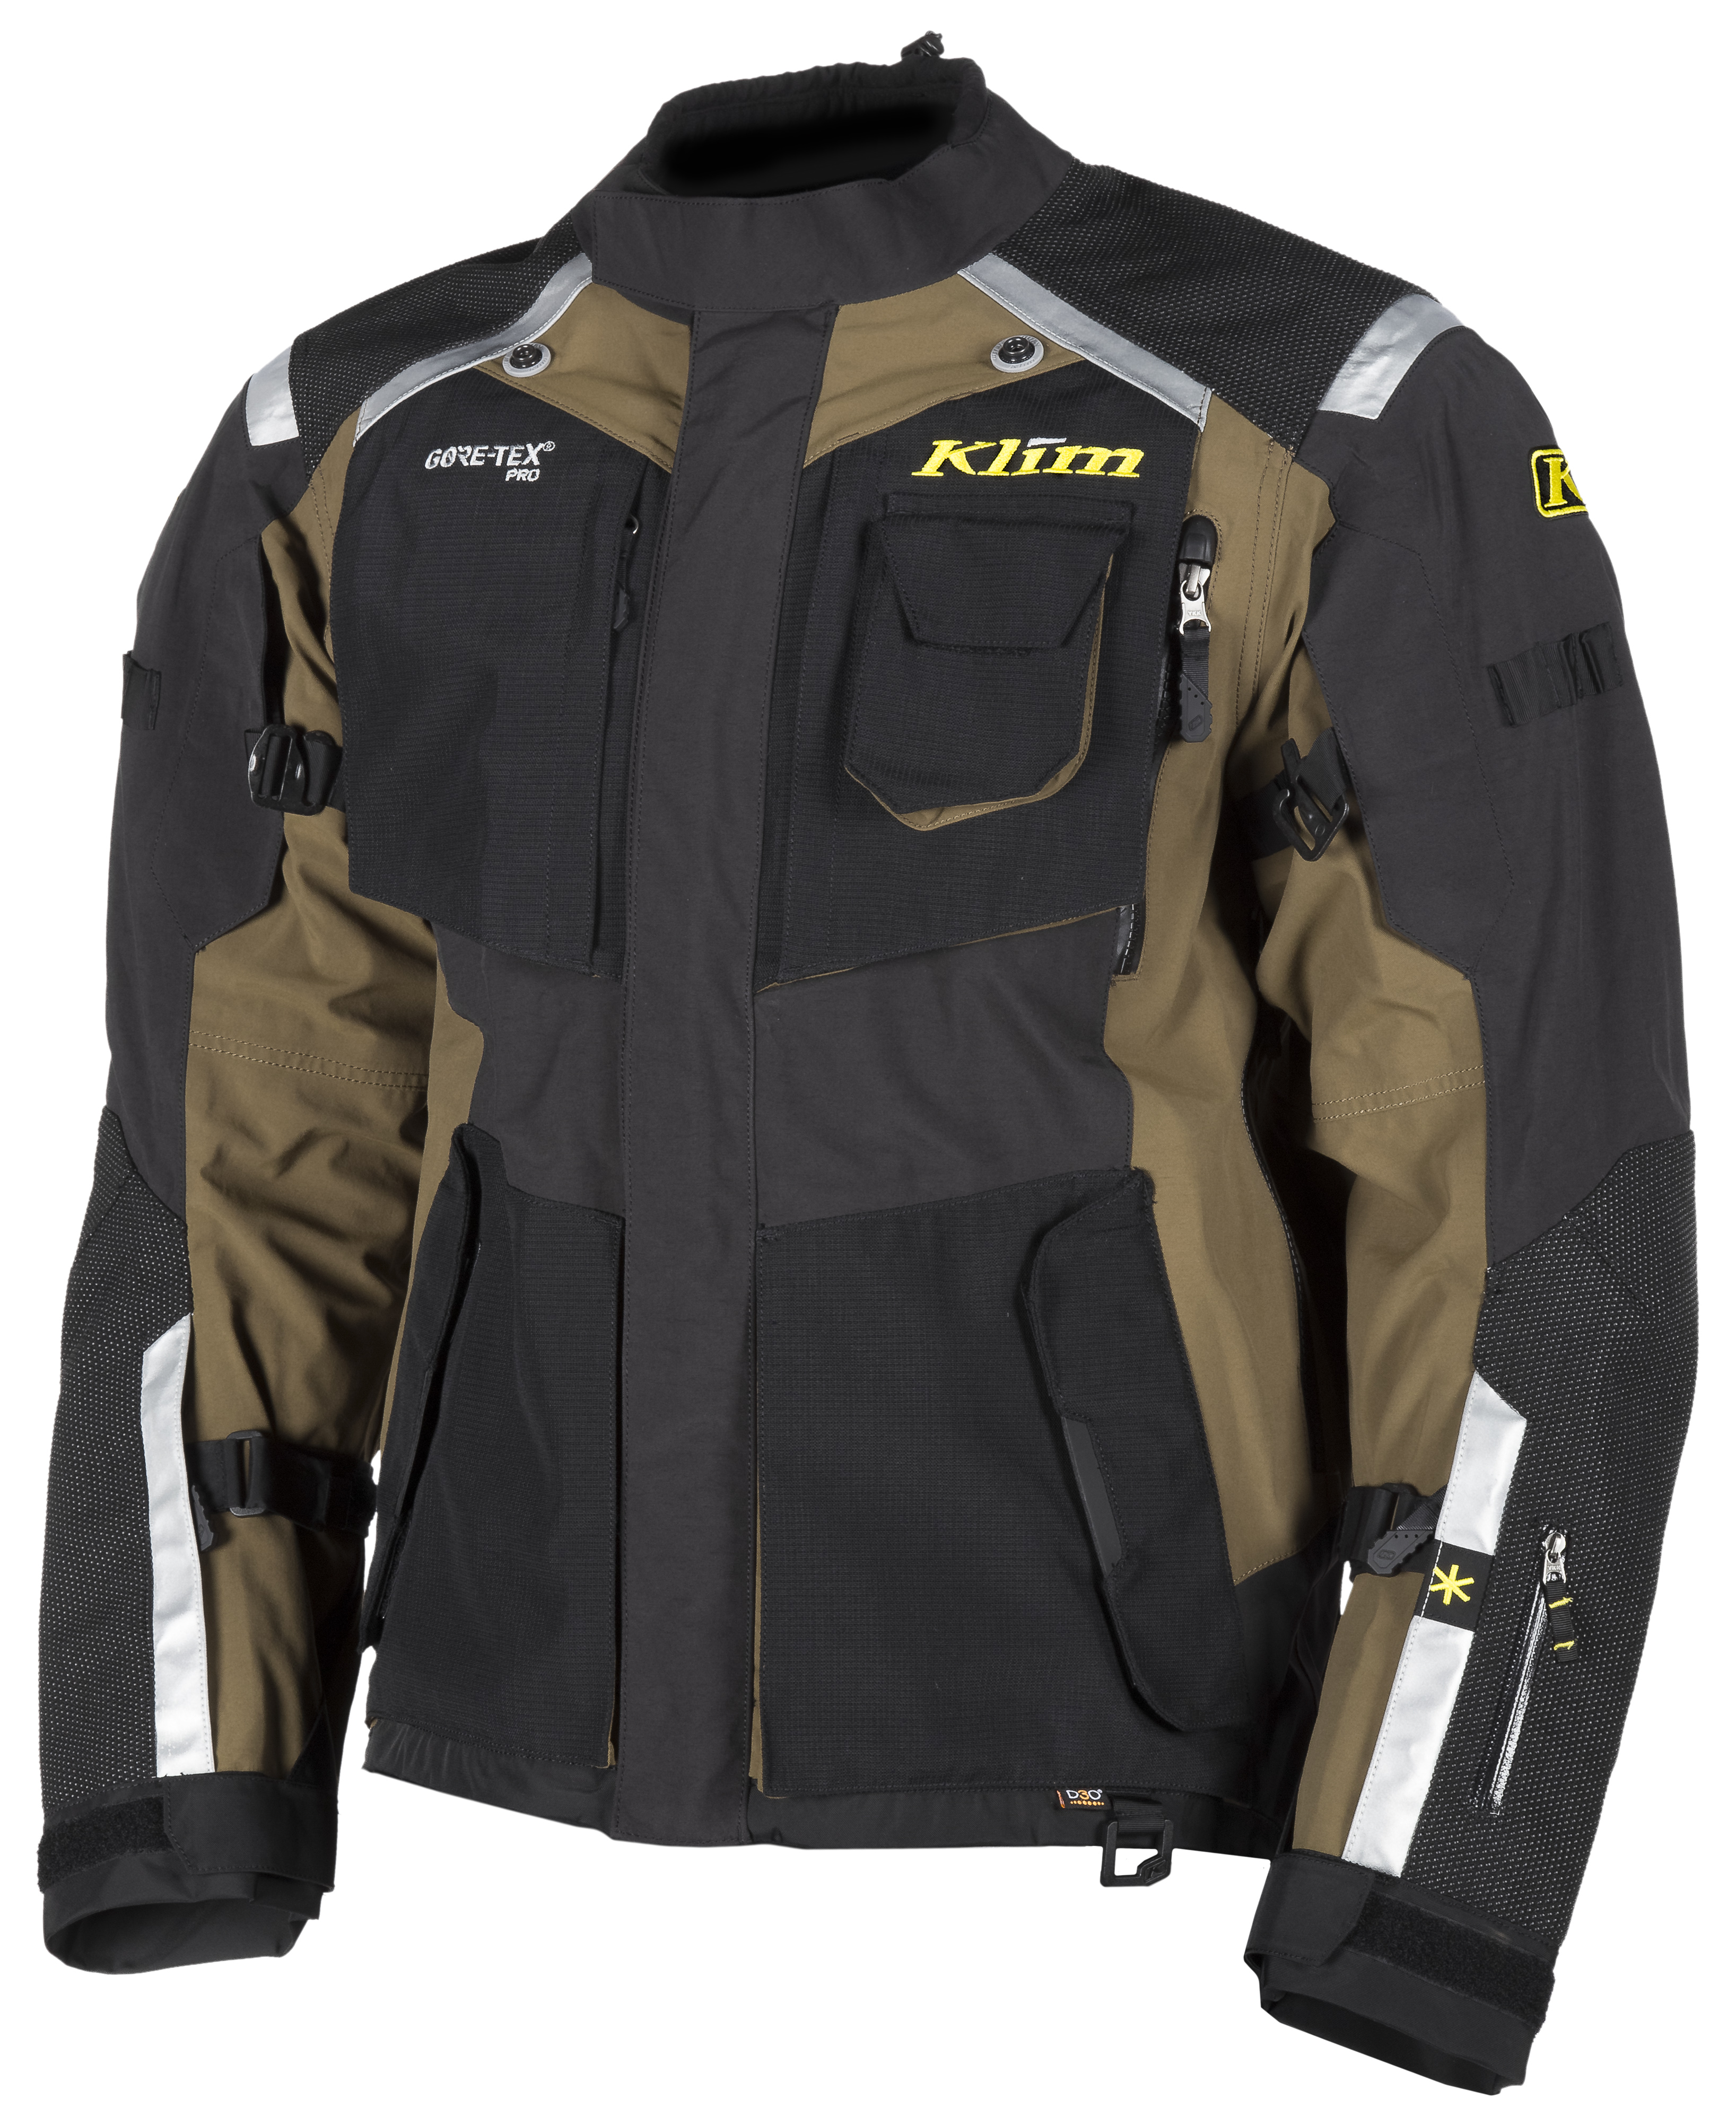 4052-001-300 Badlands Jacket